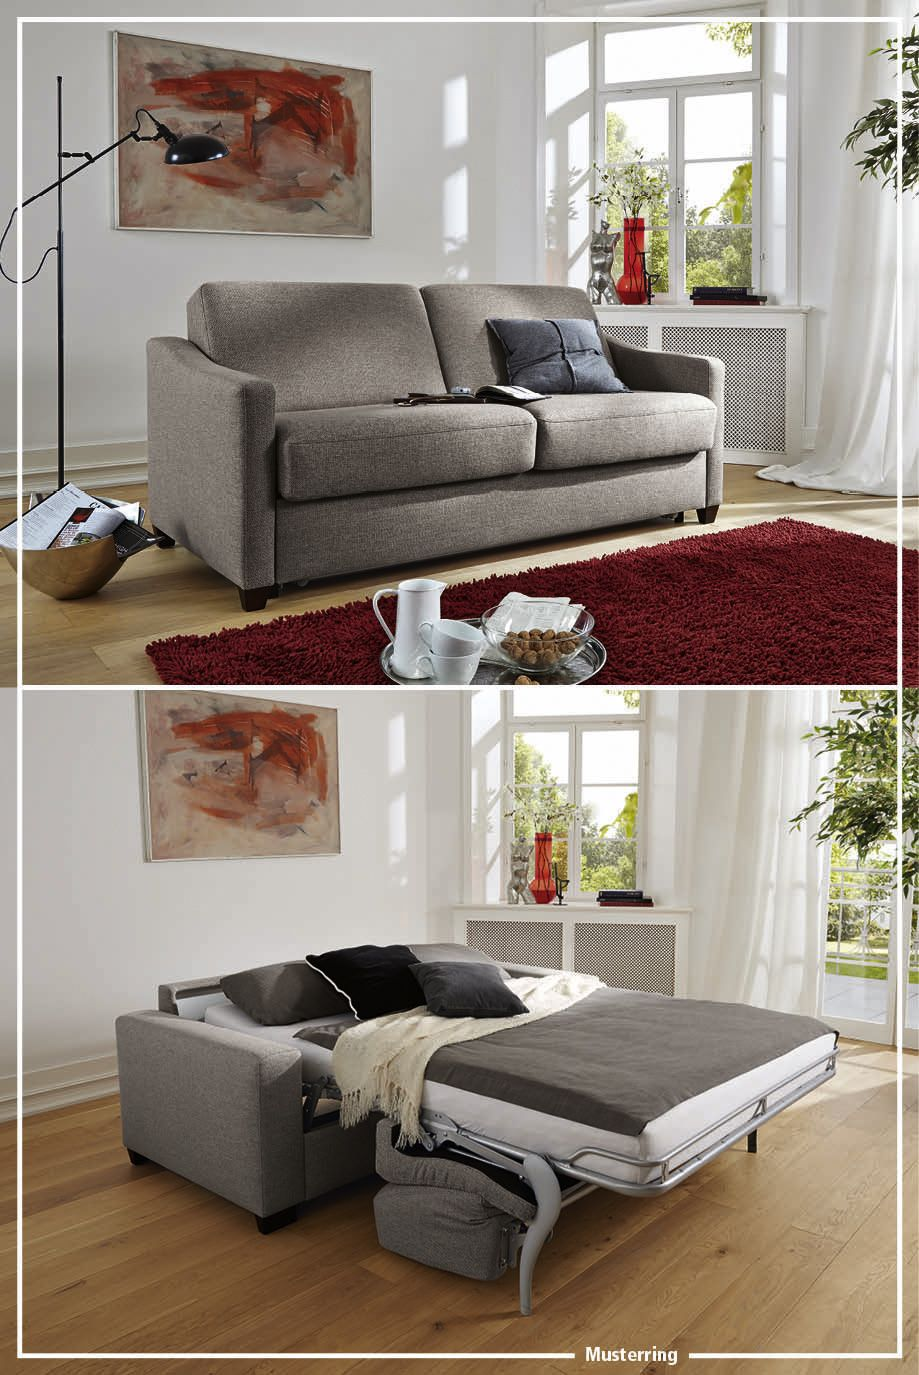 musterring mr 837 polsterm bel sitting polsterm bel sitting pinterest musterring bad. Black Bedroom Furniture Sets. Home Design Ideas